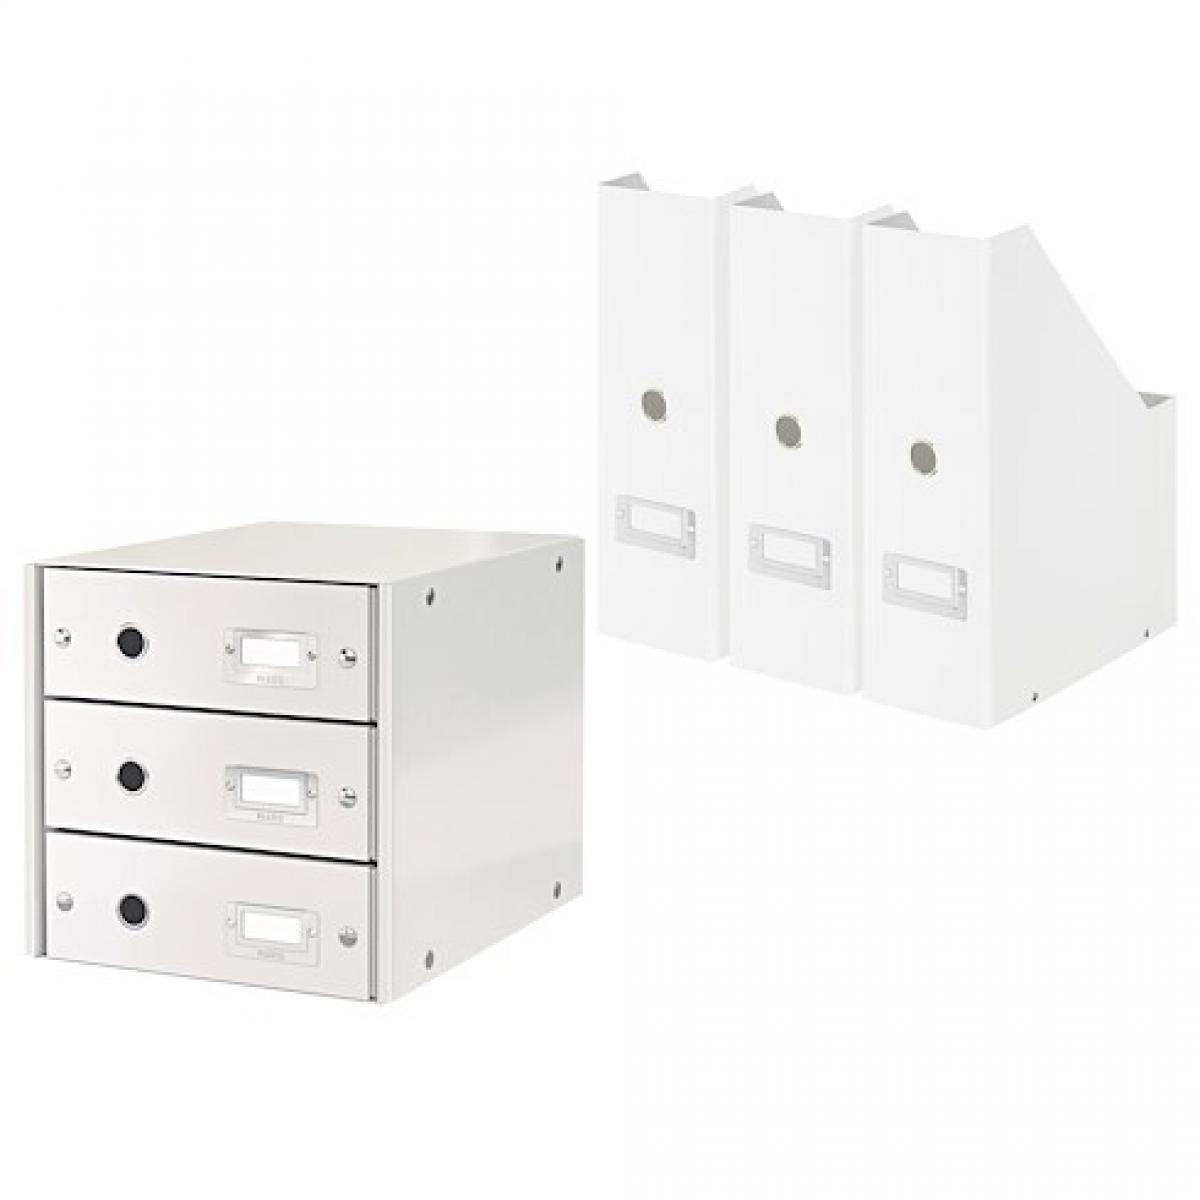 Exacompta Pack module de classement + 3 range-revues Exacompta Offissimo blancs